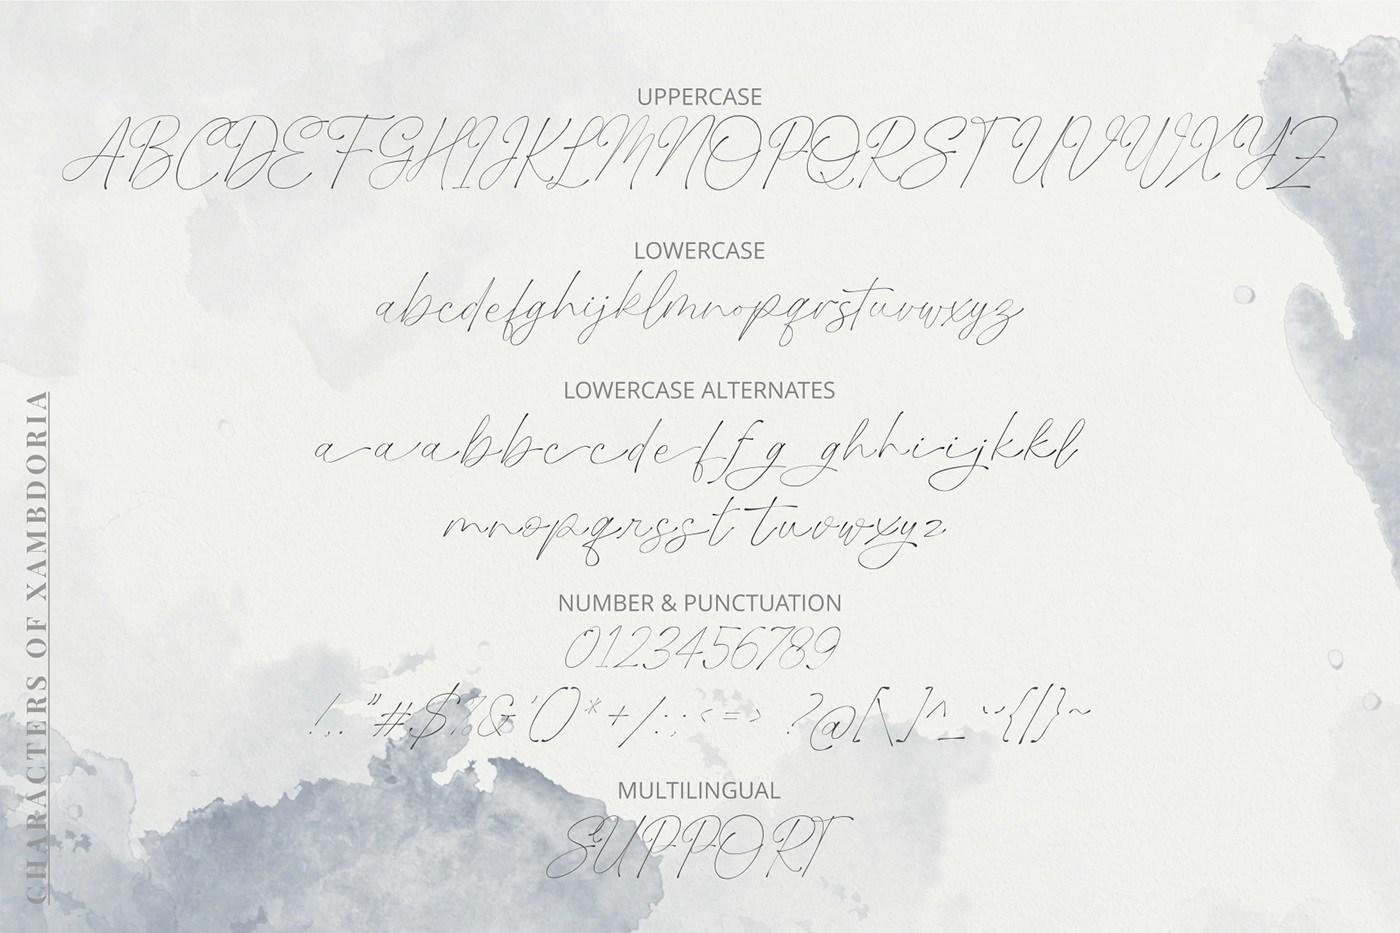 Xambdoria-Luxury-Organic-Handwritten-Font-4